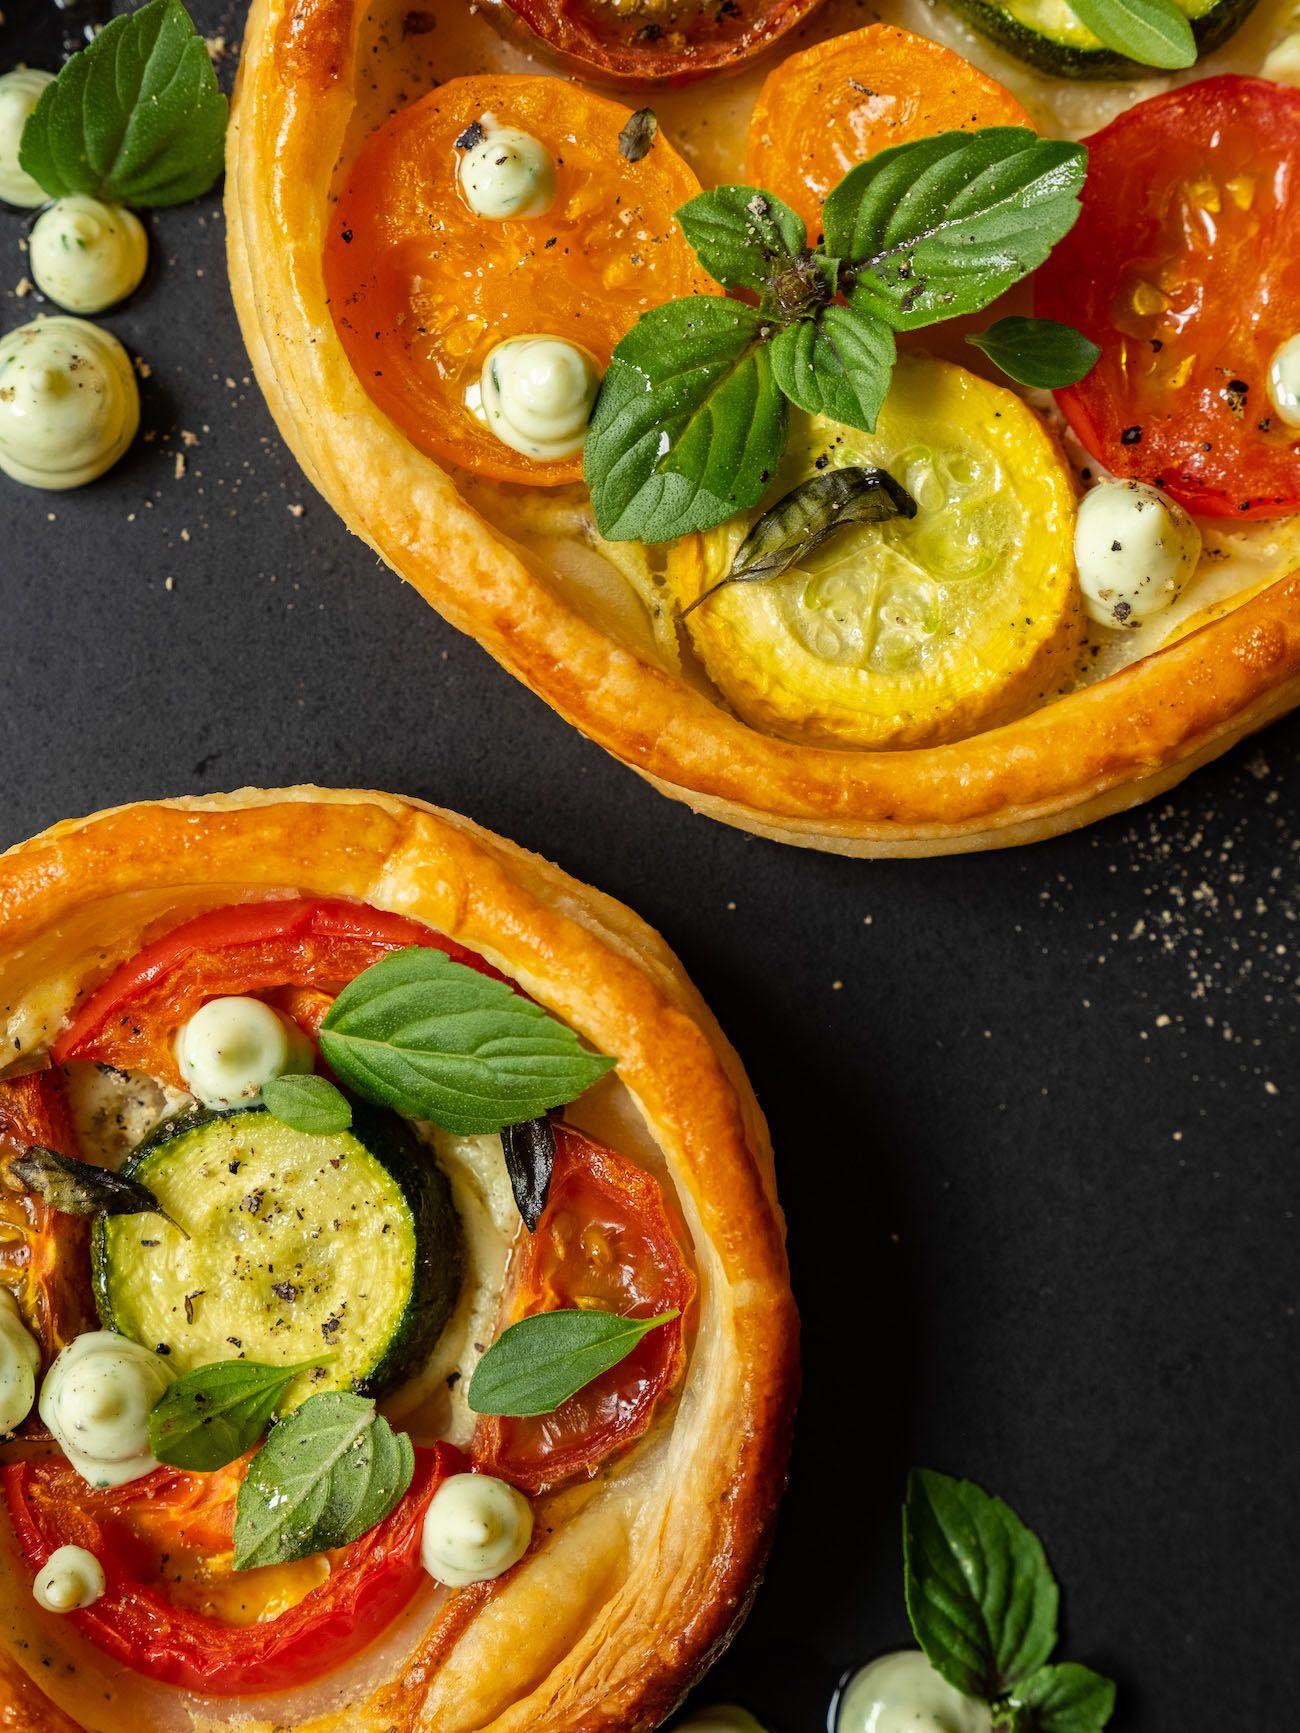 Rezept, Foodblog, About Fuel, Tomaten Zucchini Tartelettes mit Basilikum Feta Creme, Pfeffer, Oregano